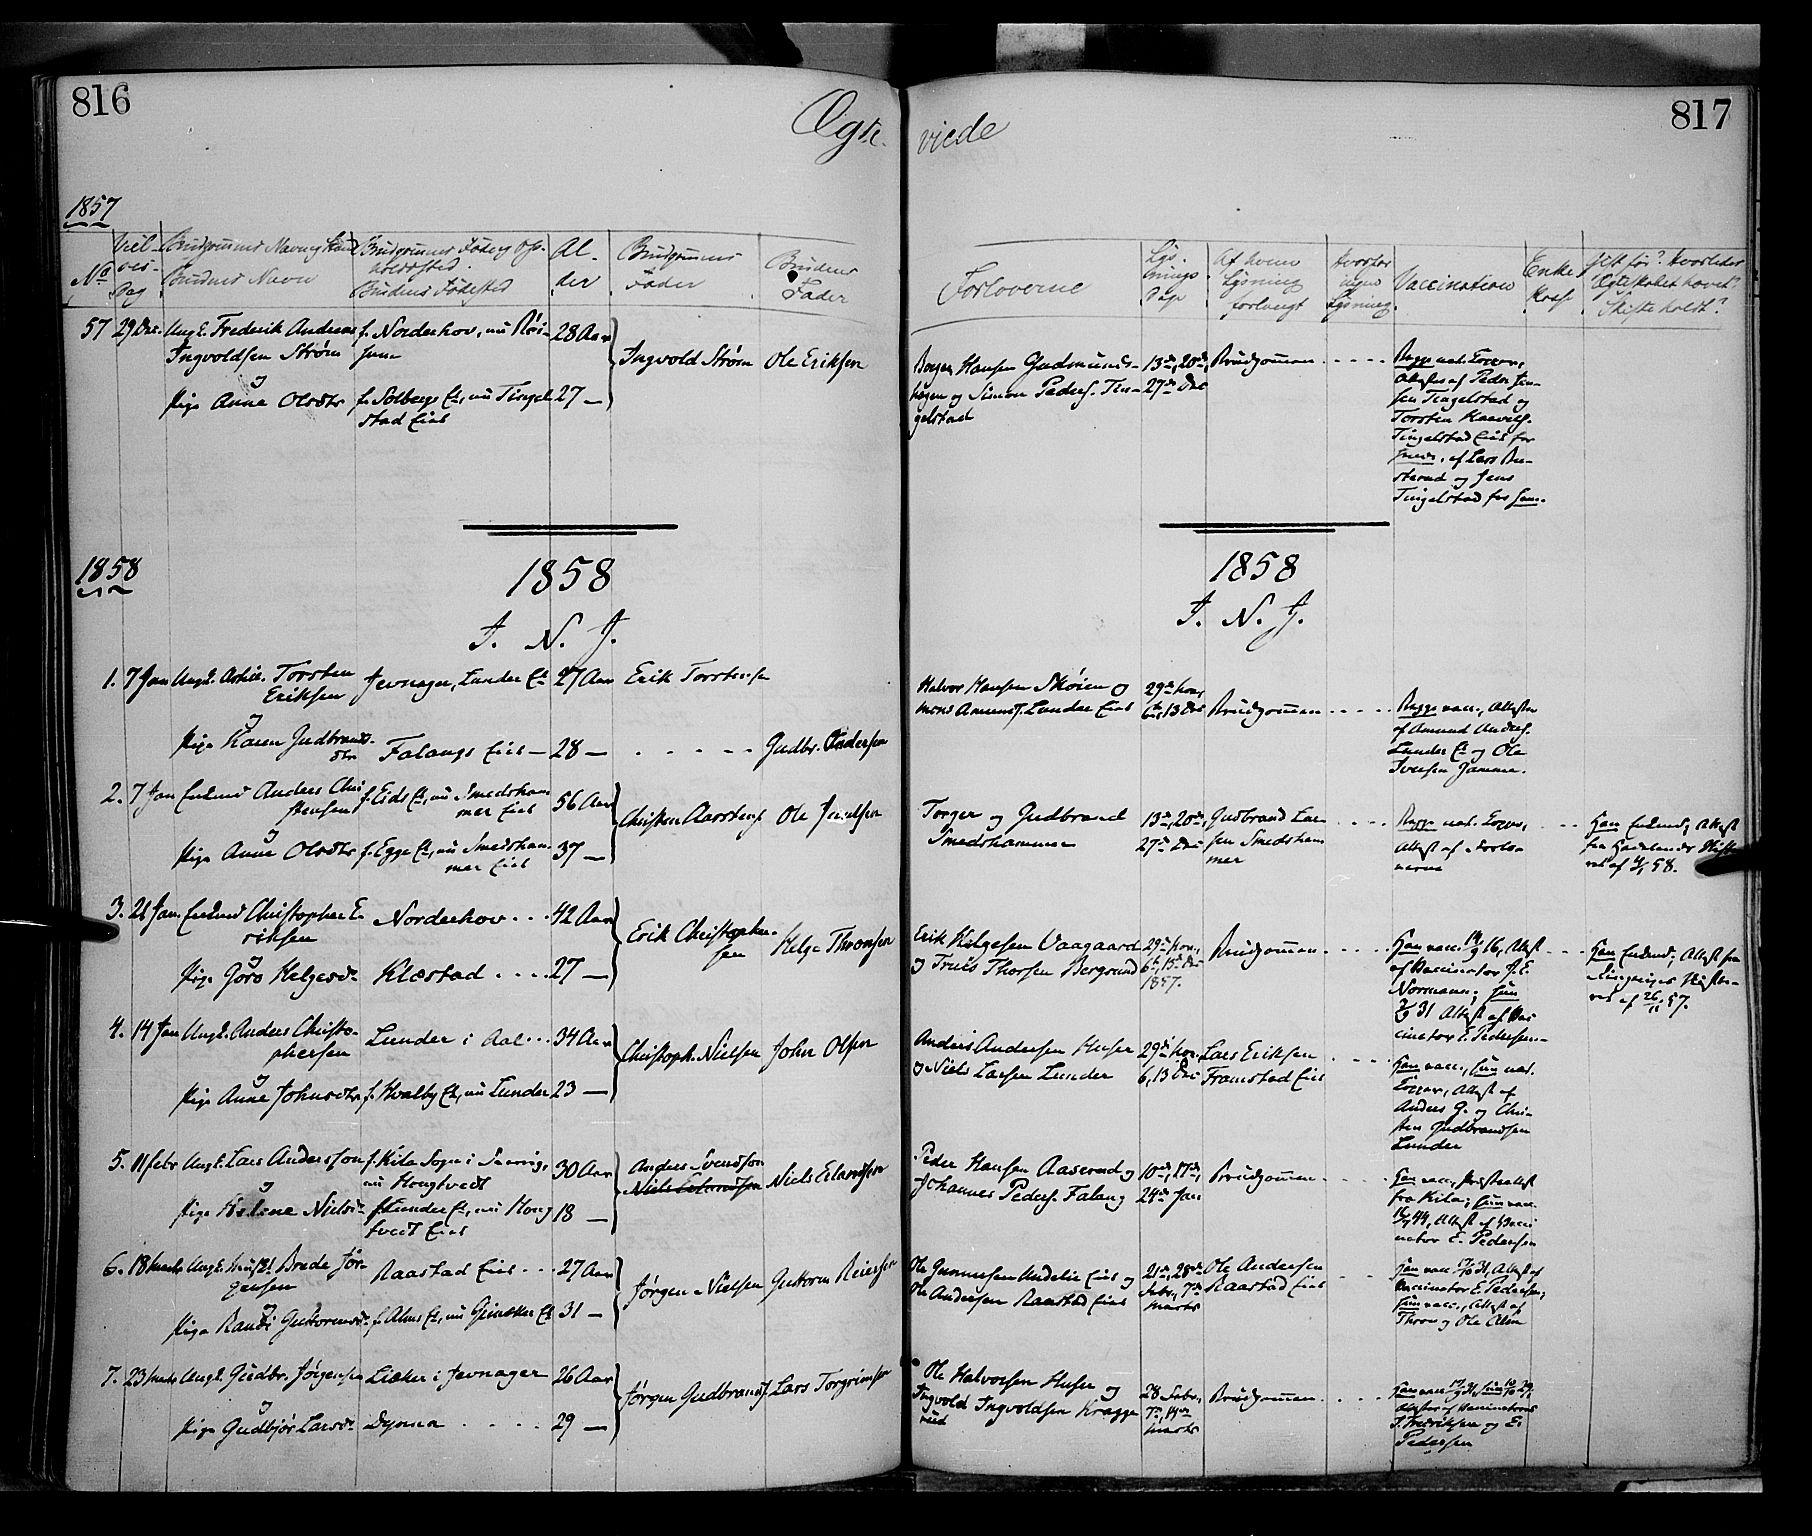 SAH, Gran prestekontor, Ministerialbok nr. 12, 1856-1874, s. 816-817